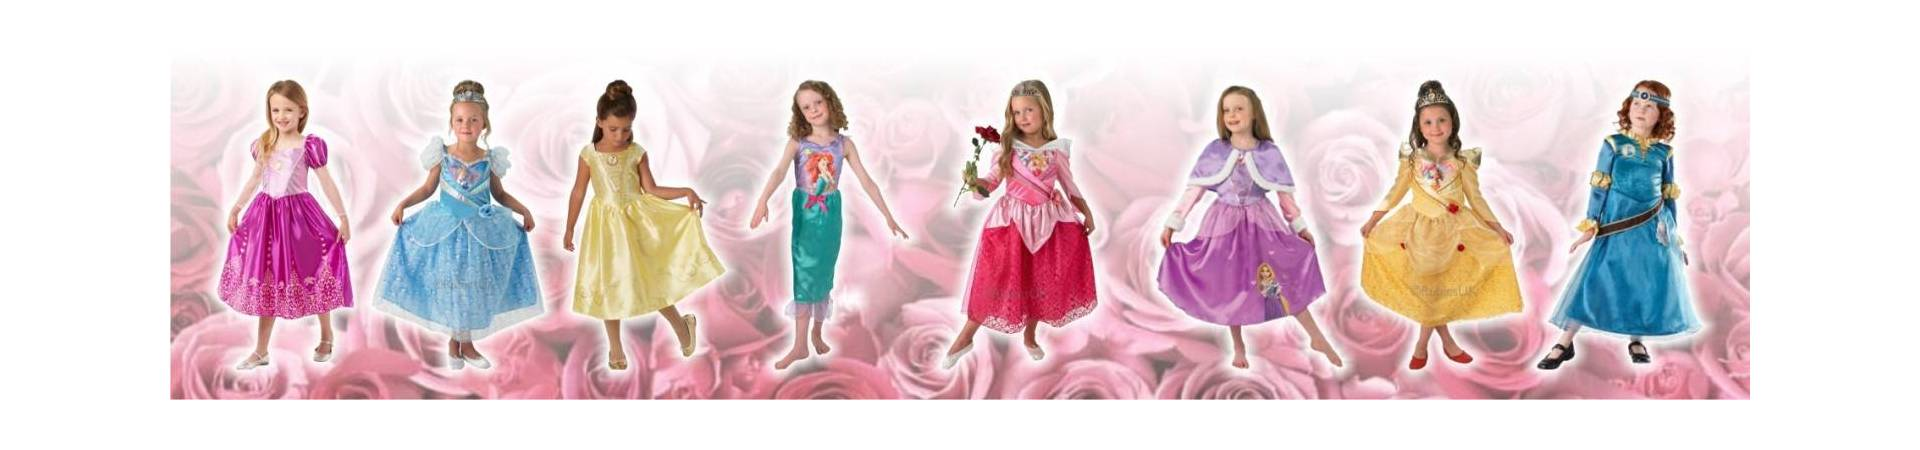 Princess - Fancy Dress